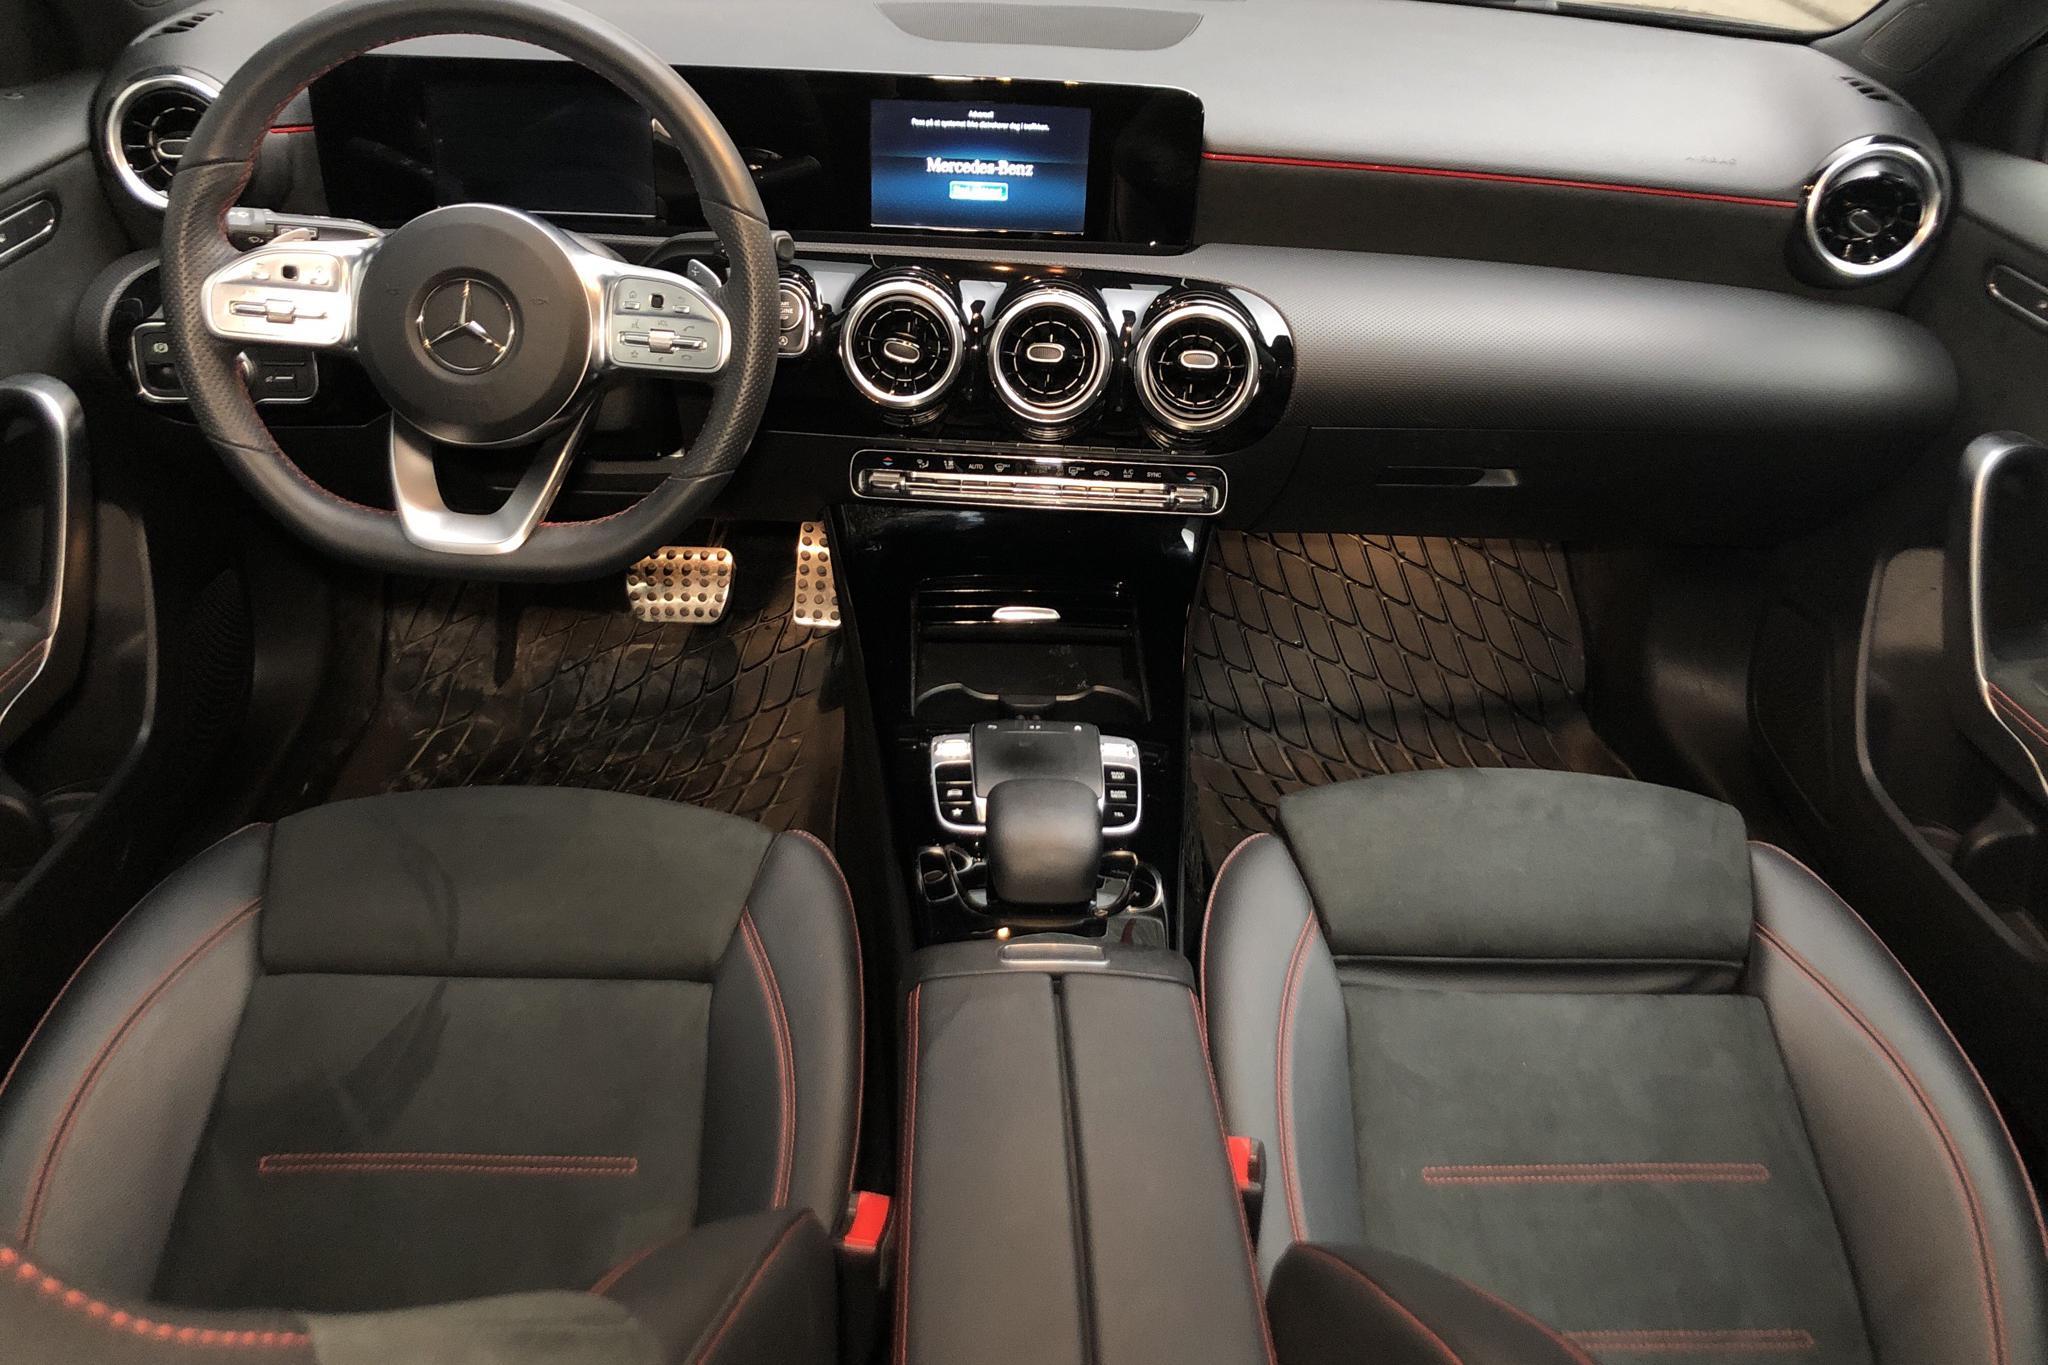 Mercedes A 180 5dr W177 (136hk) - 41 960 km - Automatic - black - 2020